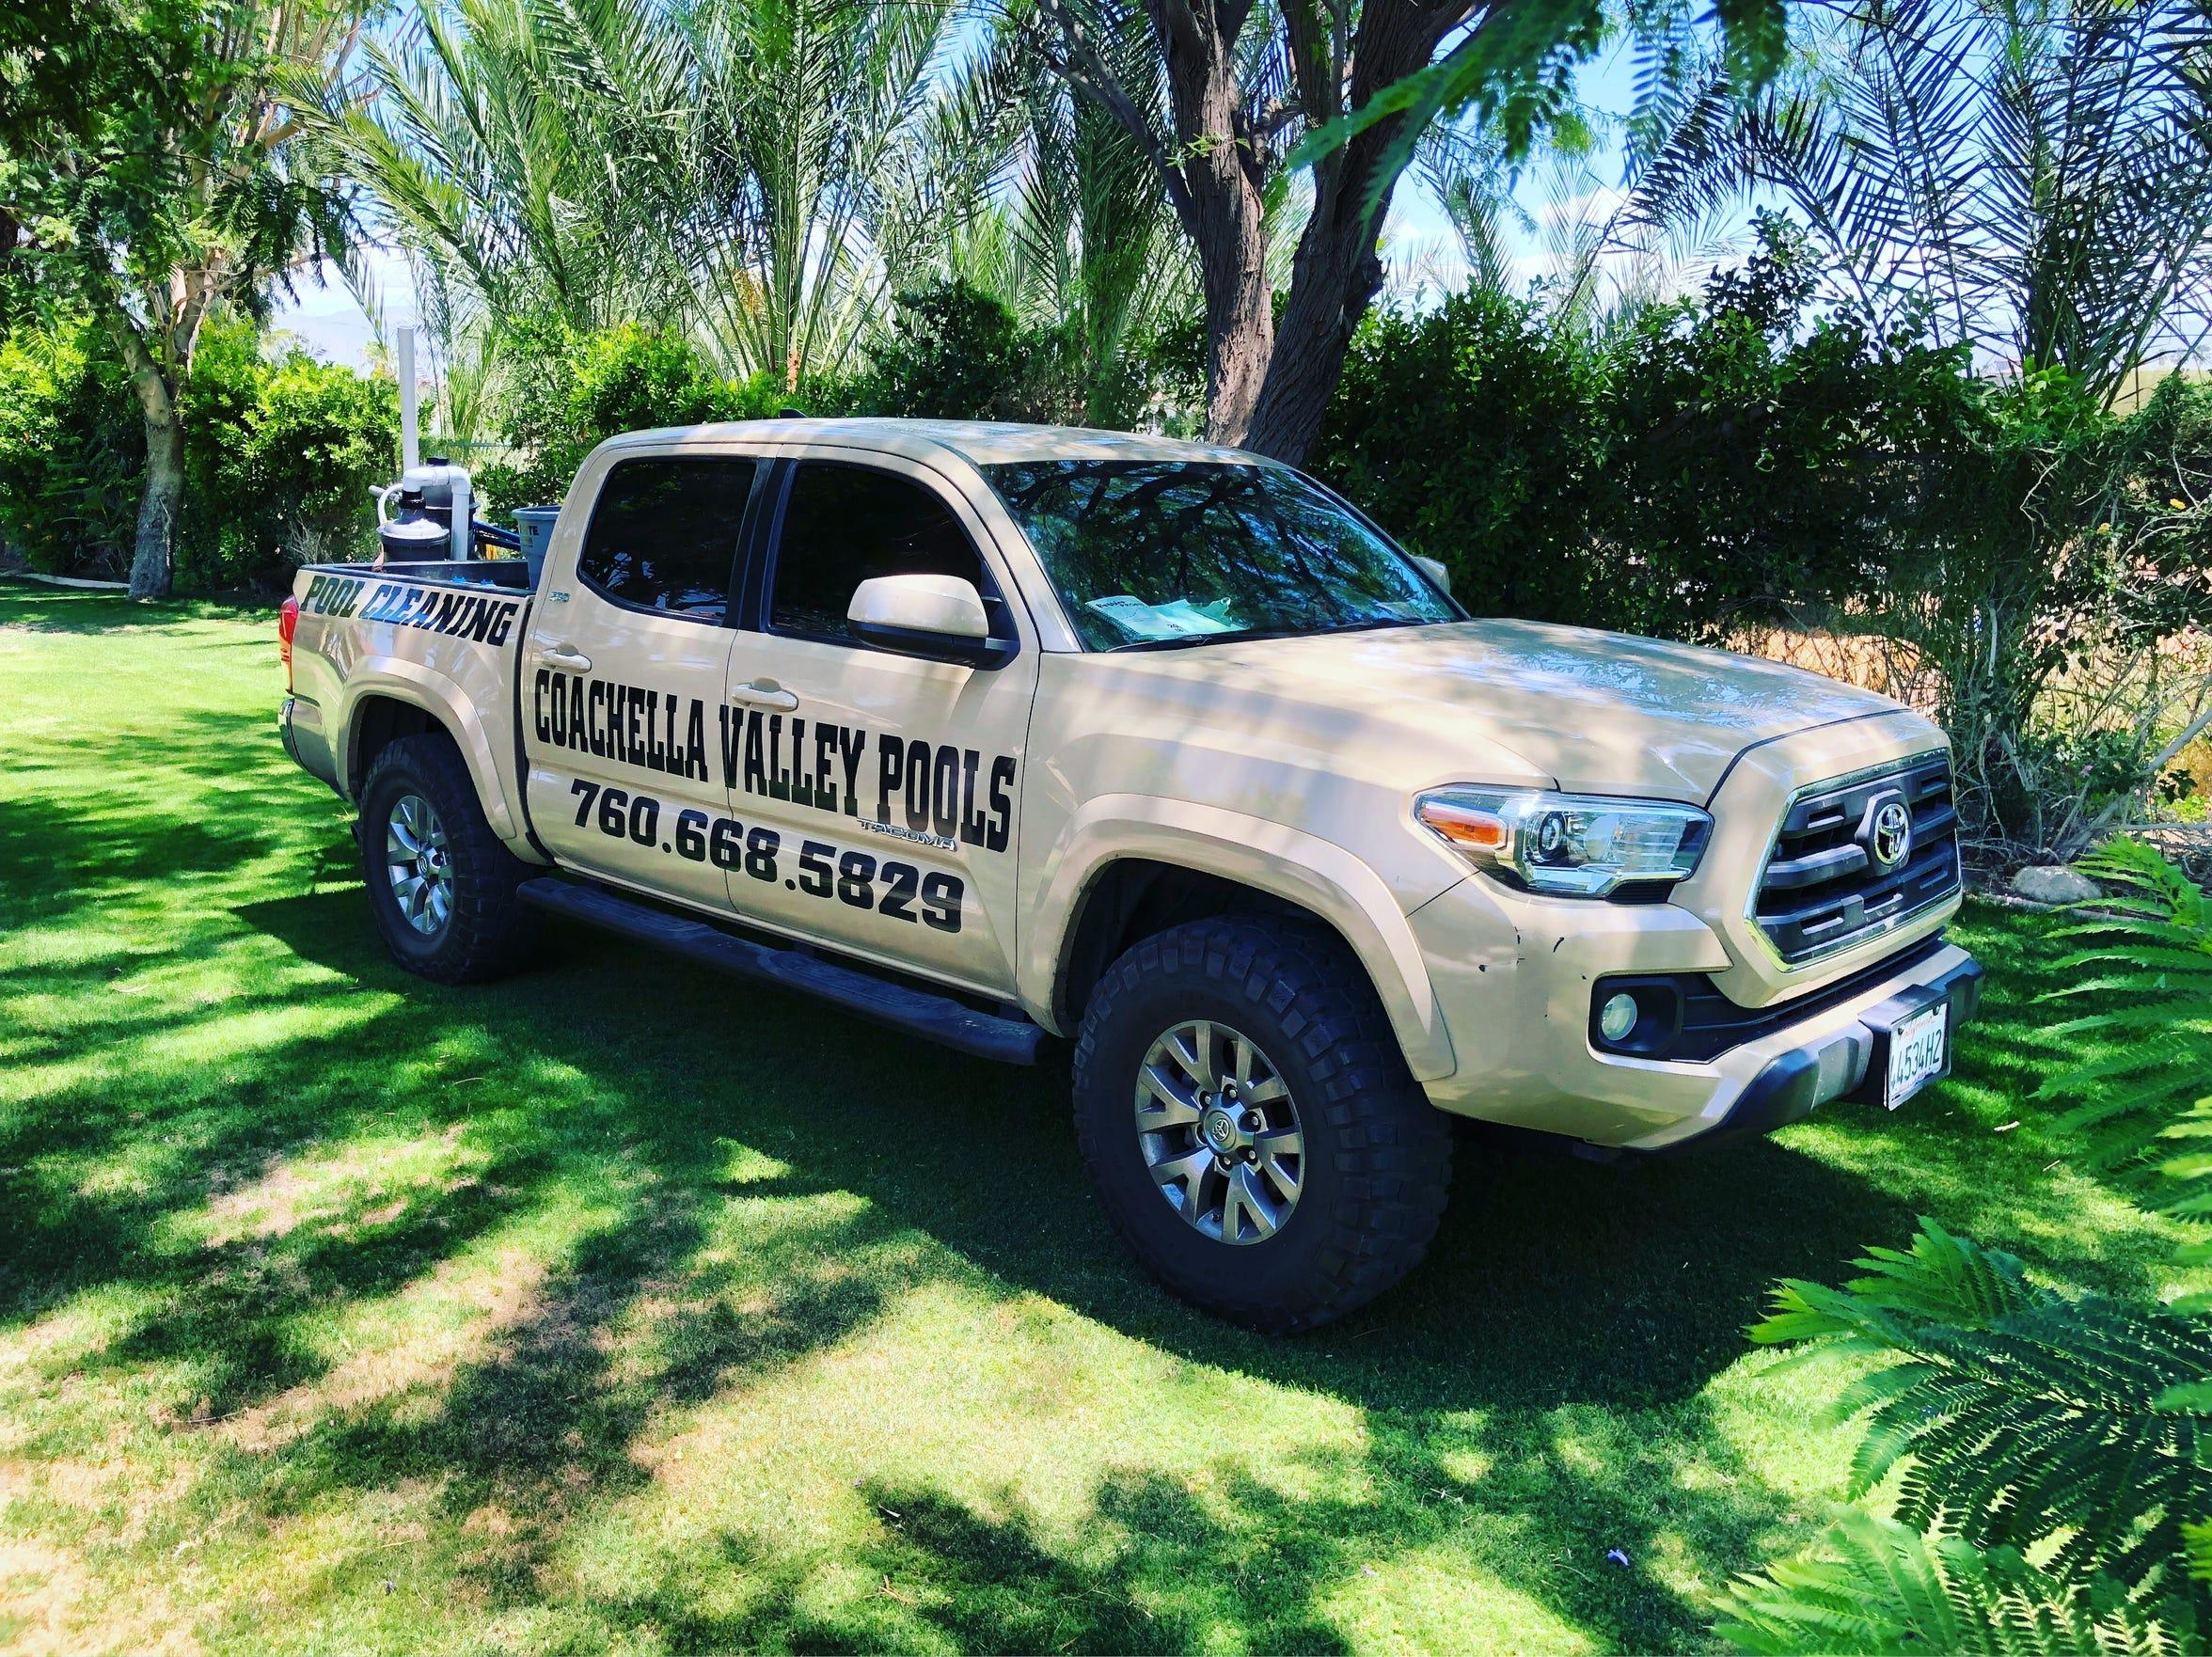 Pedro Paloalto's pickup truck for his business, Coachella Valley Pools.